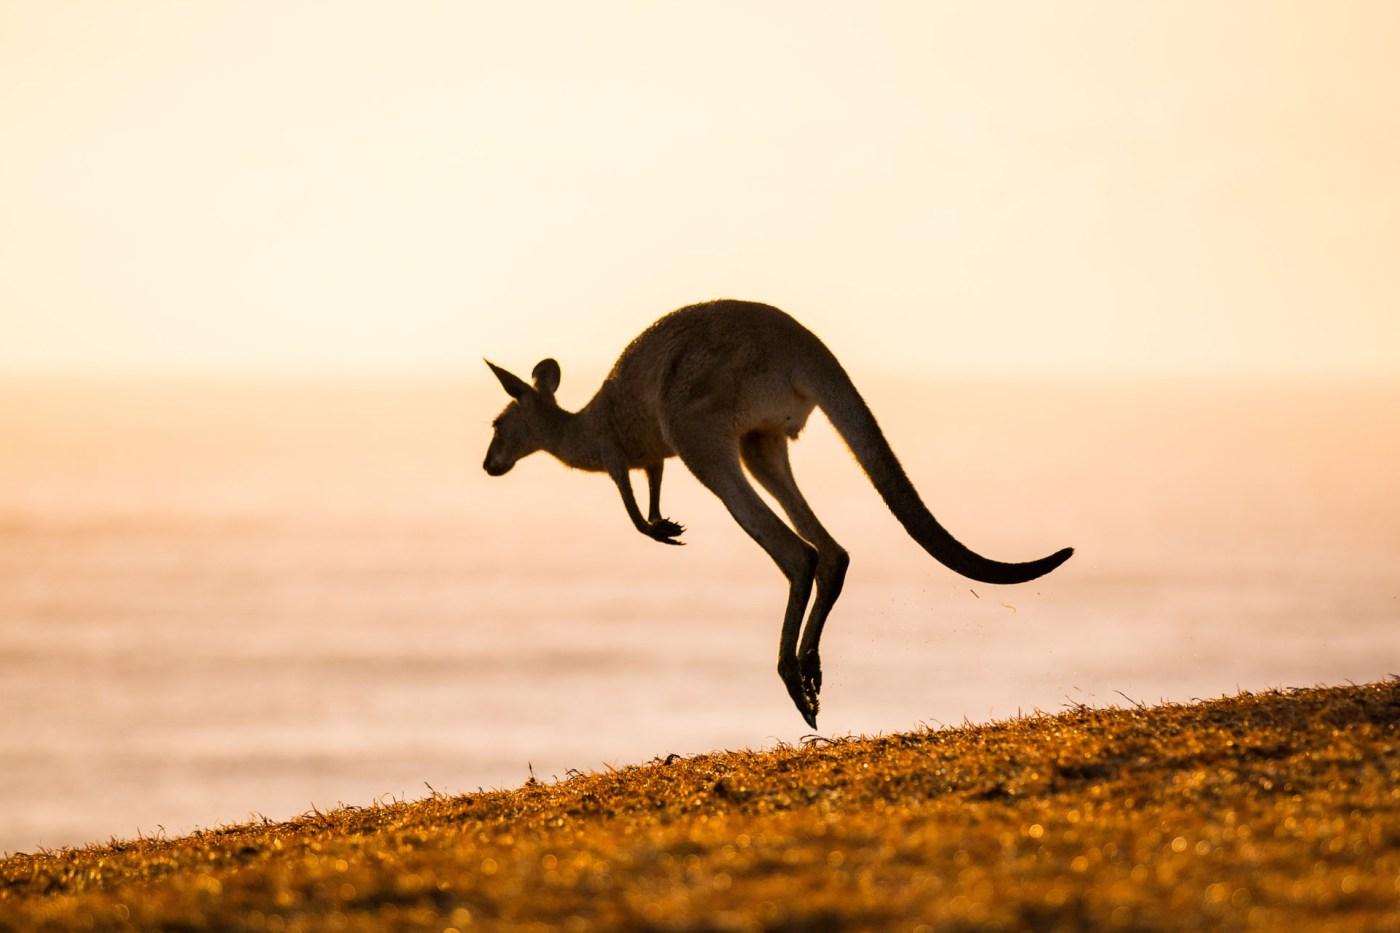 Kangaroo silhouette - Franzi Photography